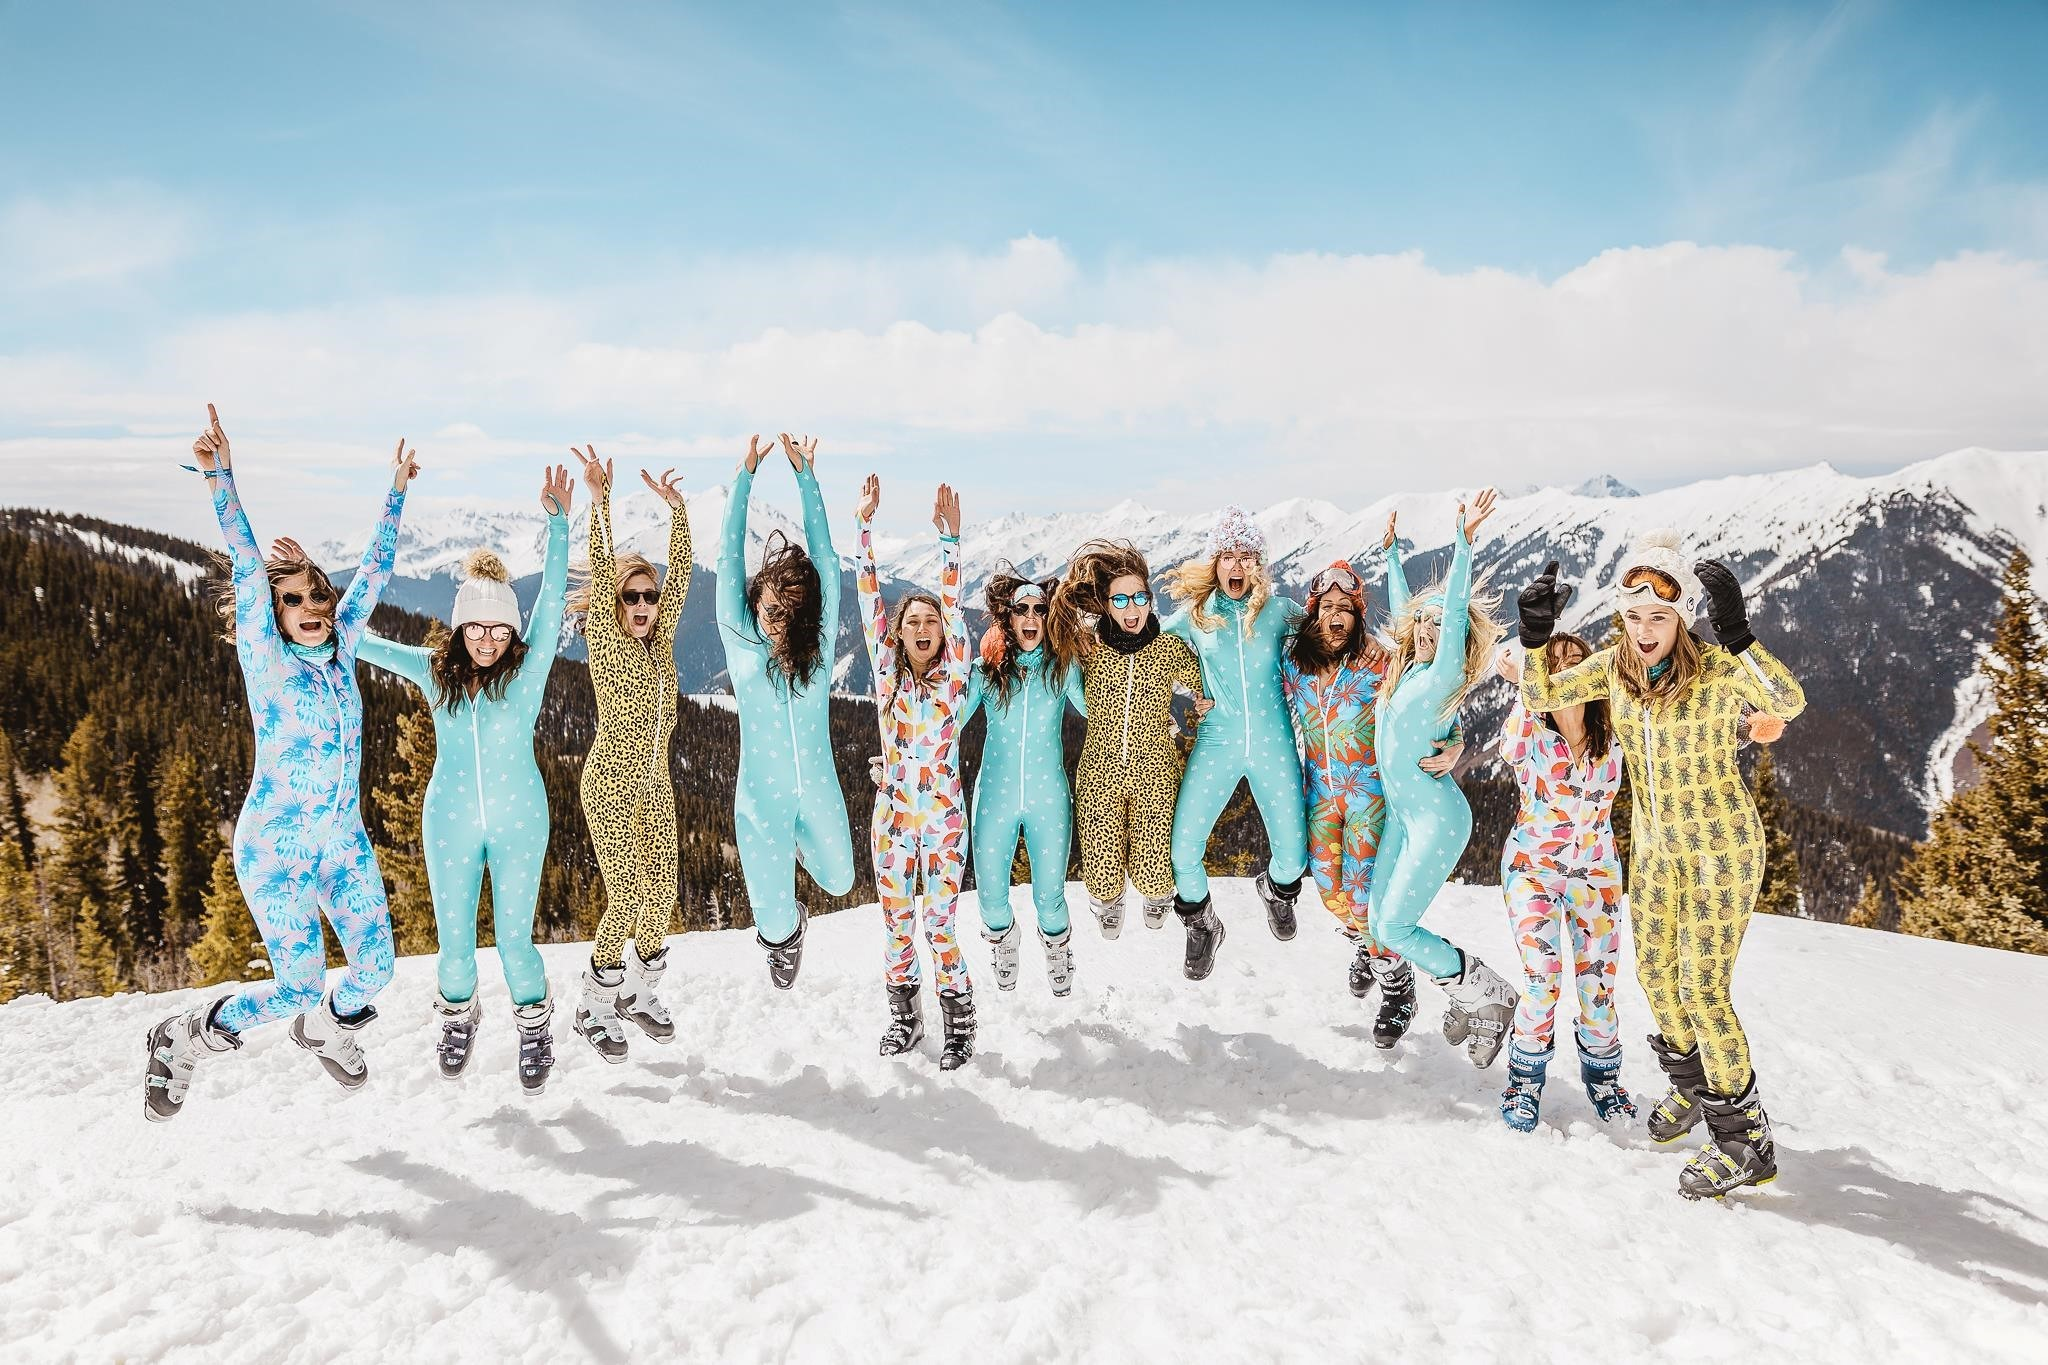 SKI SAFARI#afspraak boven op de berg met je gekste outfit